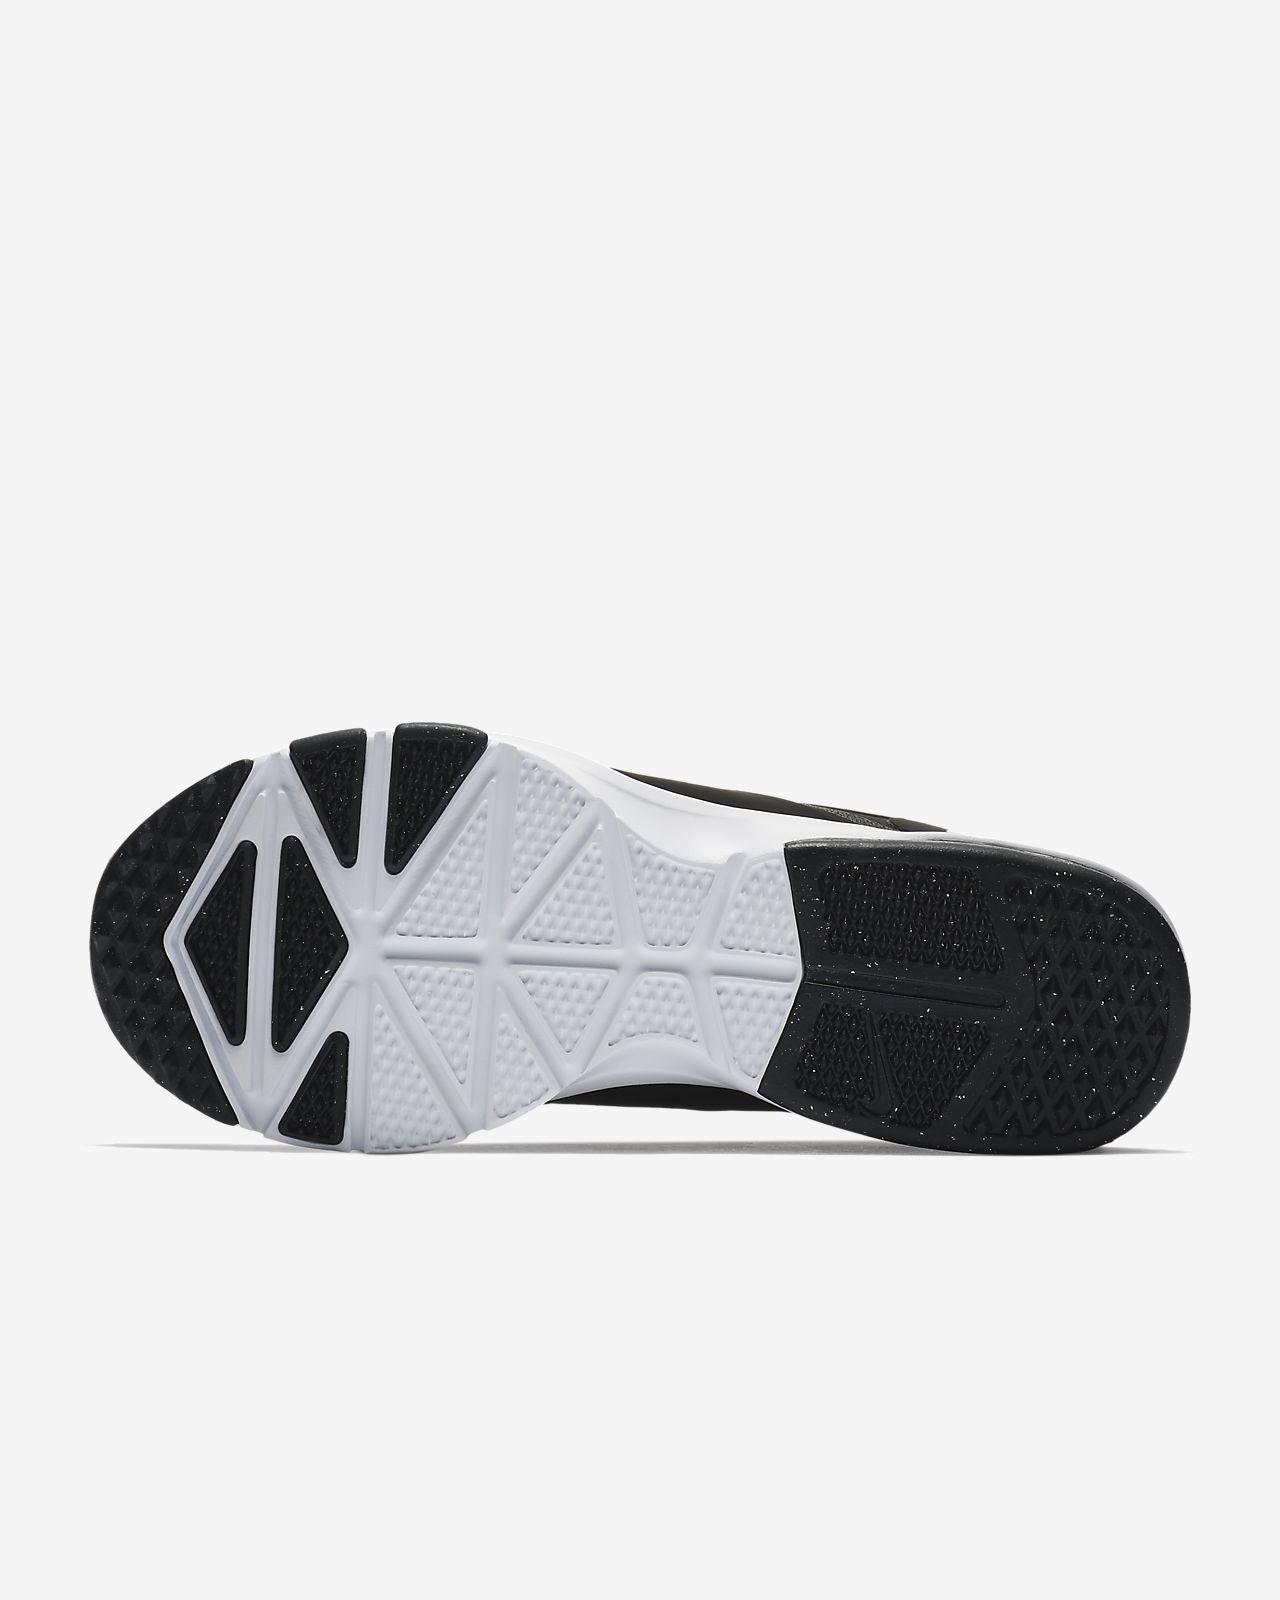 9e863a0b2fa9 Nike Air Bella TR Women s Training Shoe. Nike.com IE